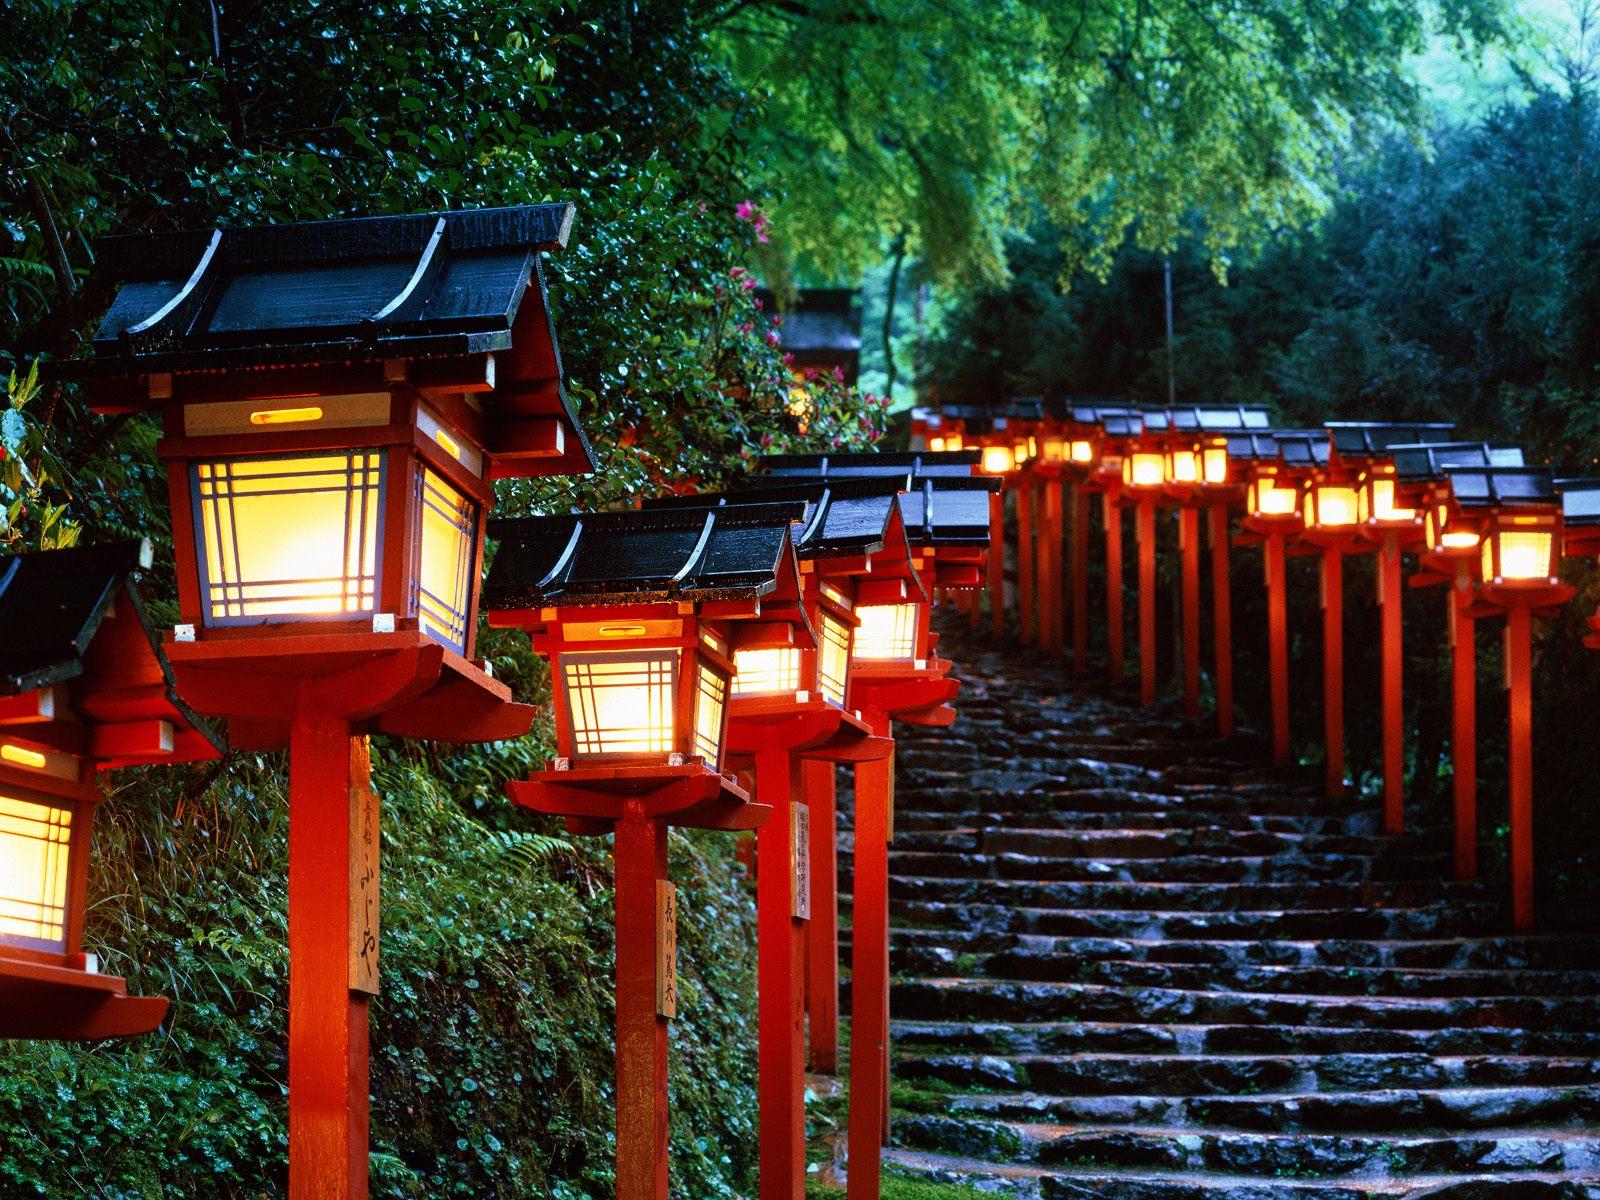 http://3.bp.blogspot.com/-GzdY5-rh_FI/TrRNk3HeW_I/AAAAAAAAA3I/kn2lH5wlvR0/s1600/Kibune-Shrine-Kyoto-Japan-1-1600x1200.jpg